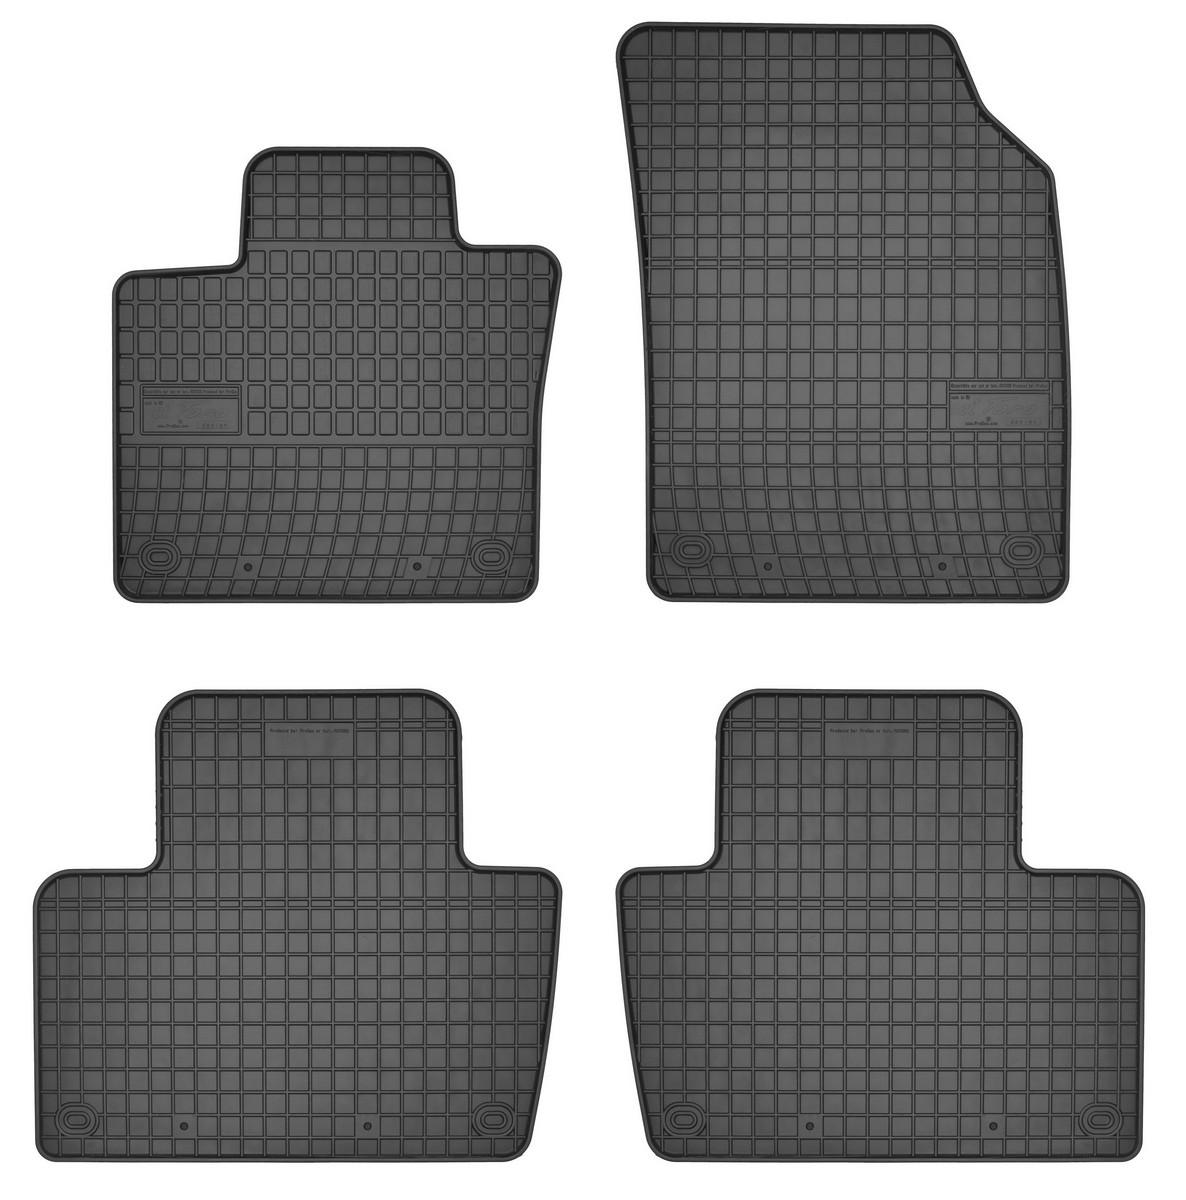 Gumové rohože do auta, VOLVO XC90 II, 2015-